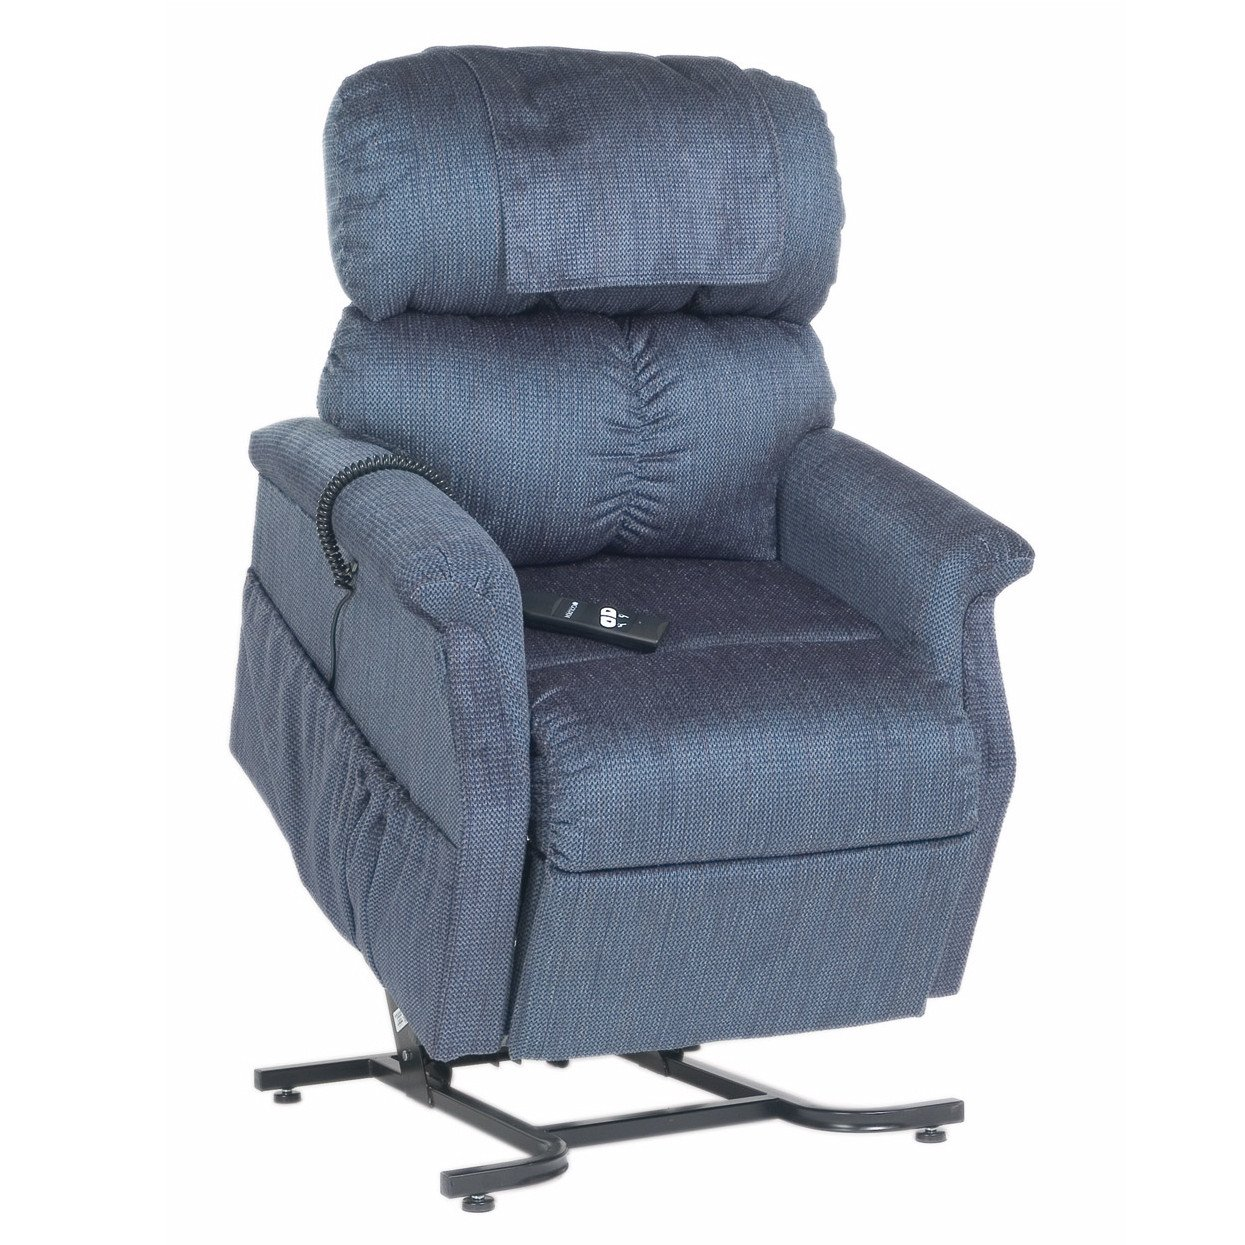 Comforter 3-Position